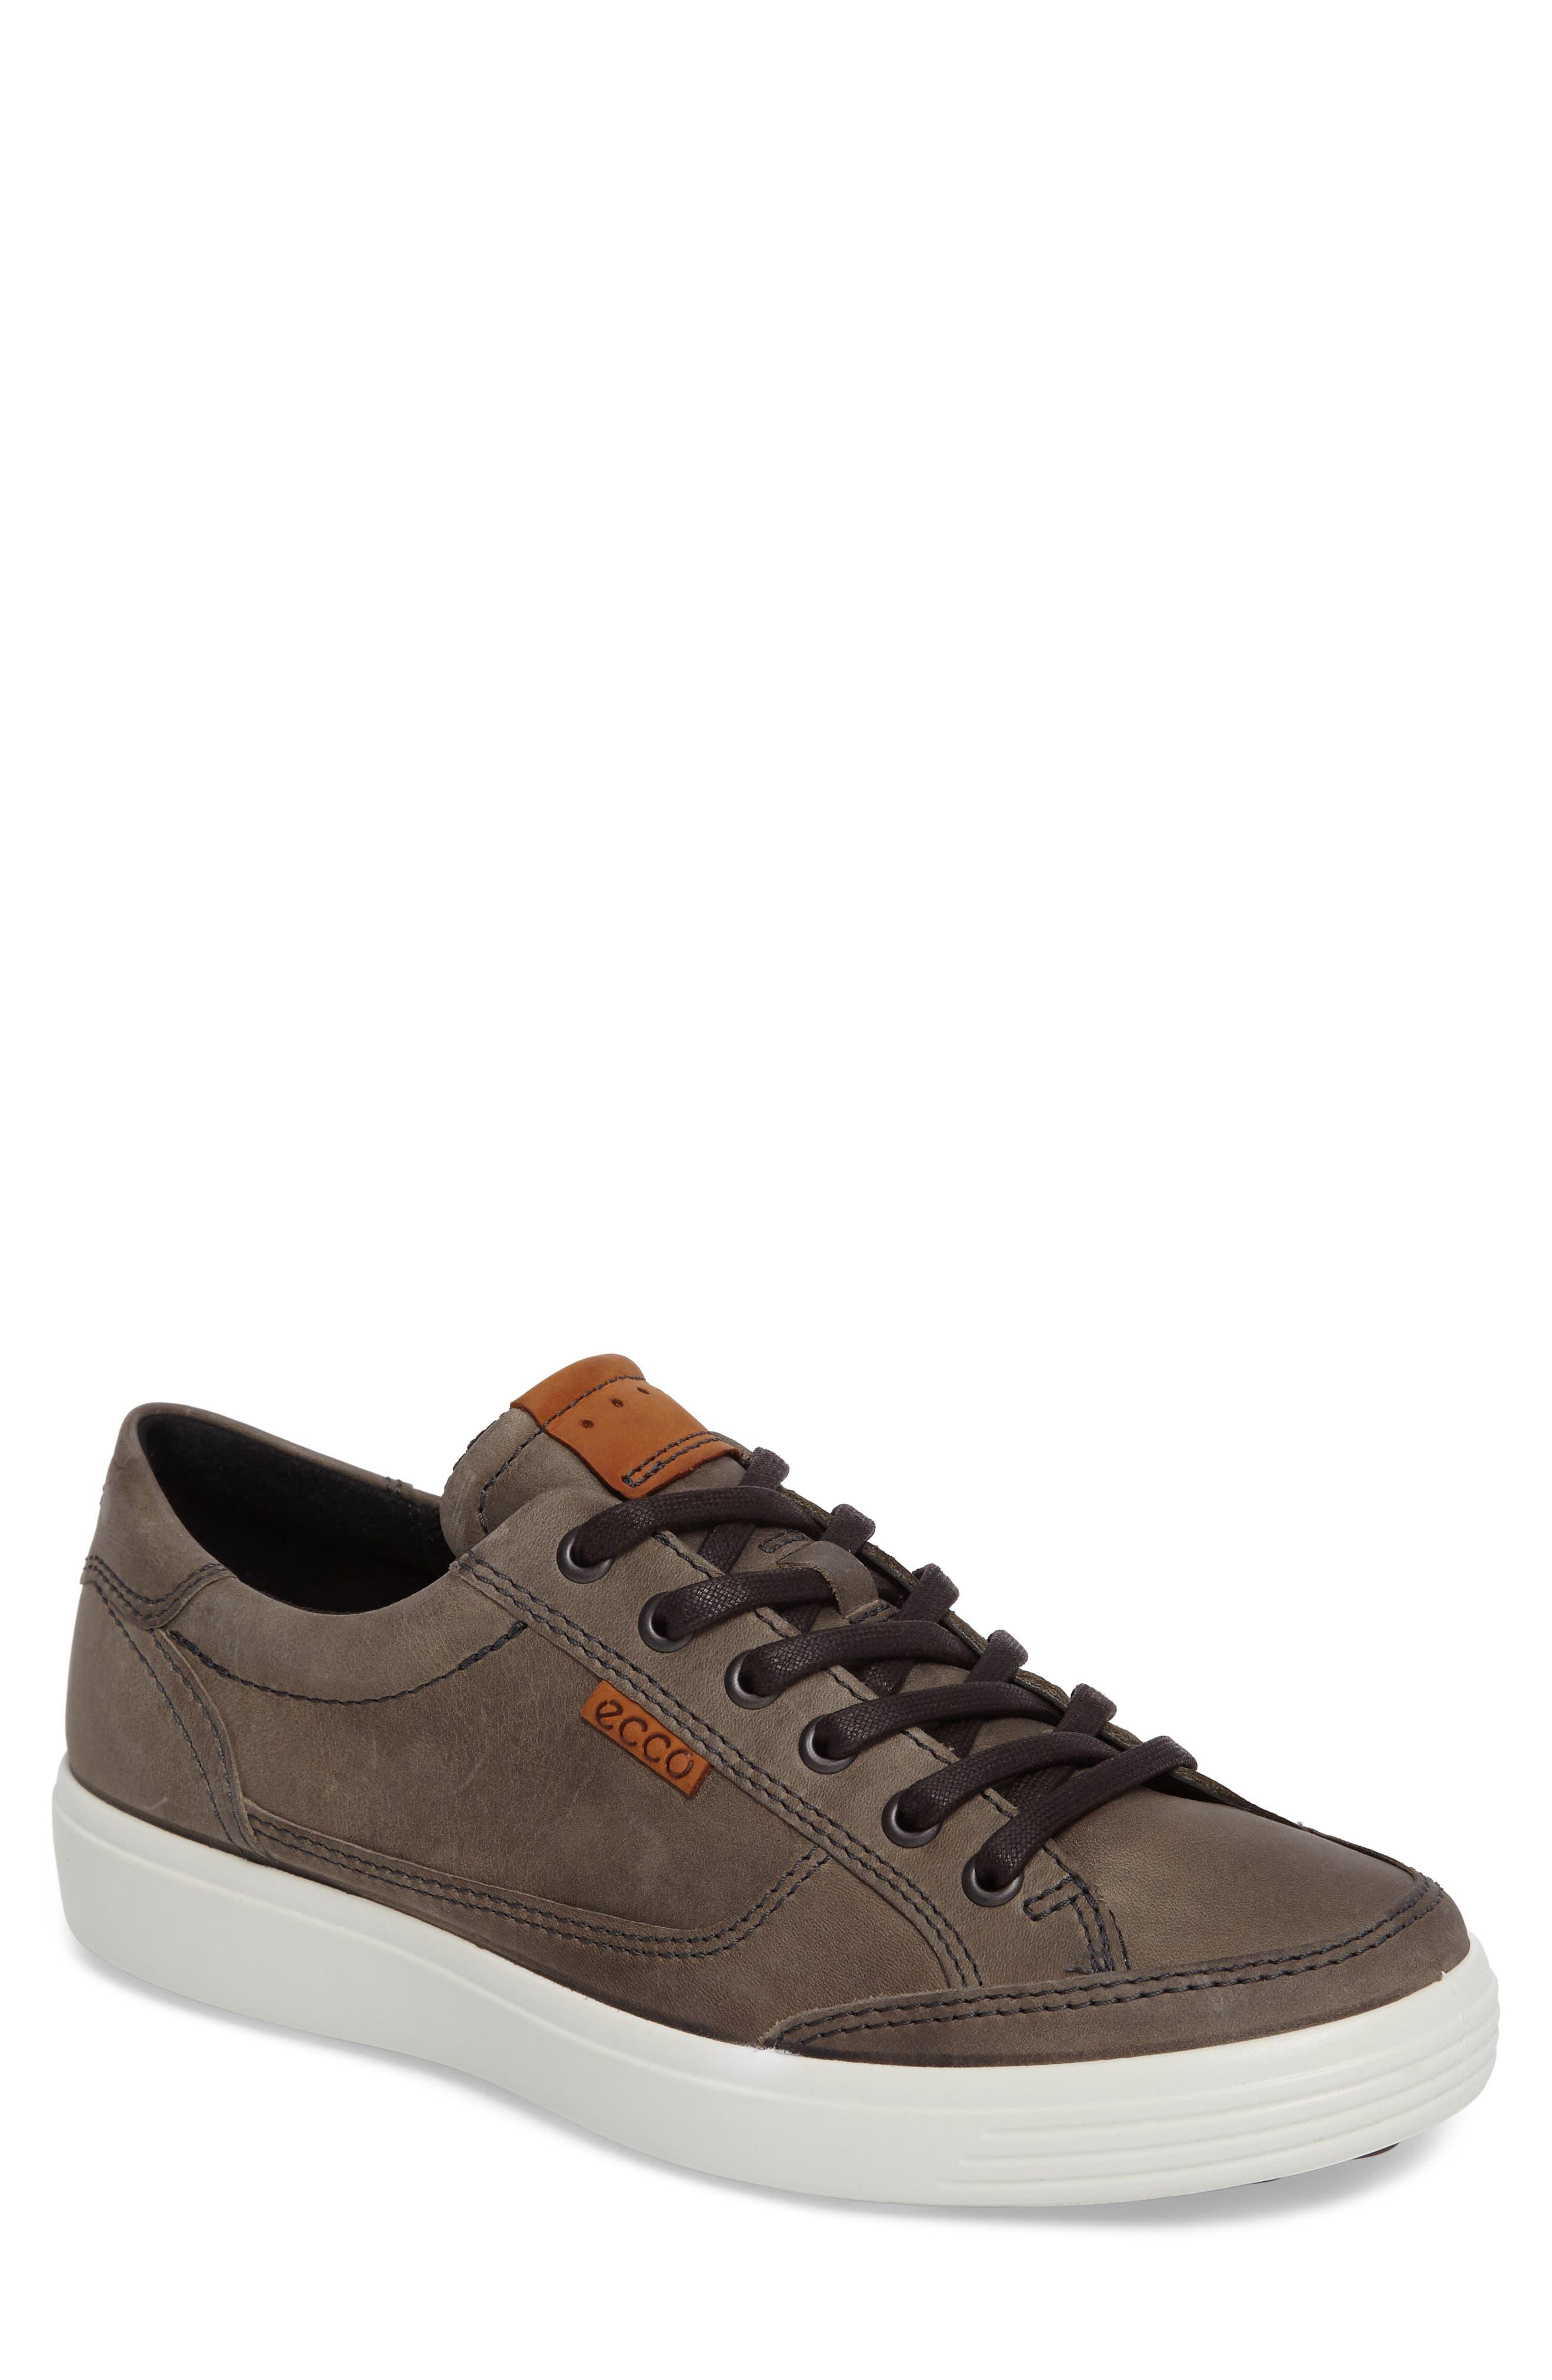 Soft 7 Sneaker,                         Main,                         color, Wild Dove Leather